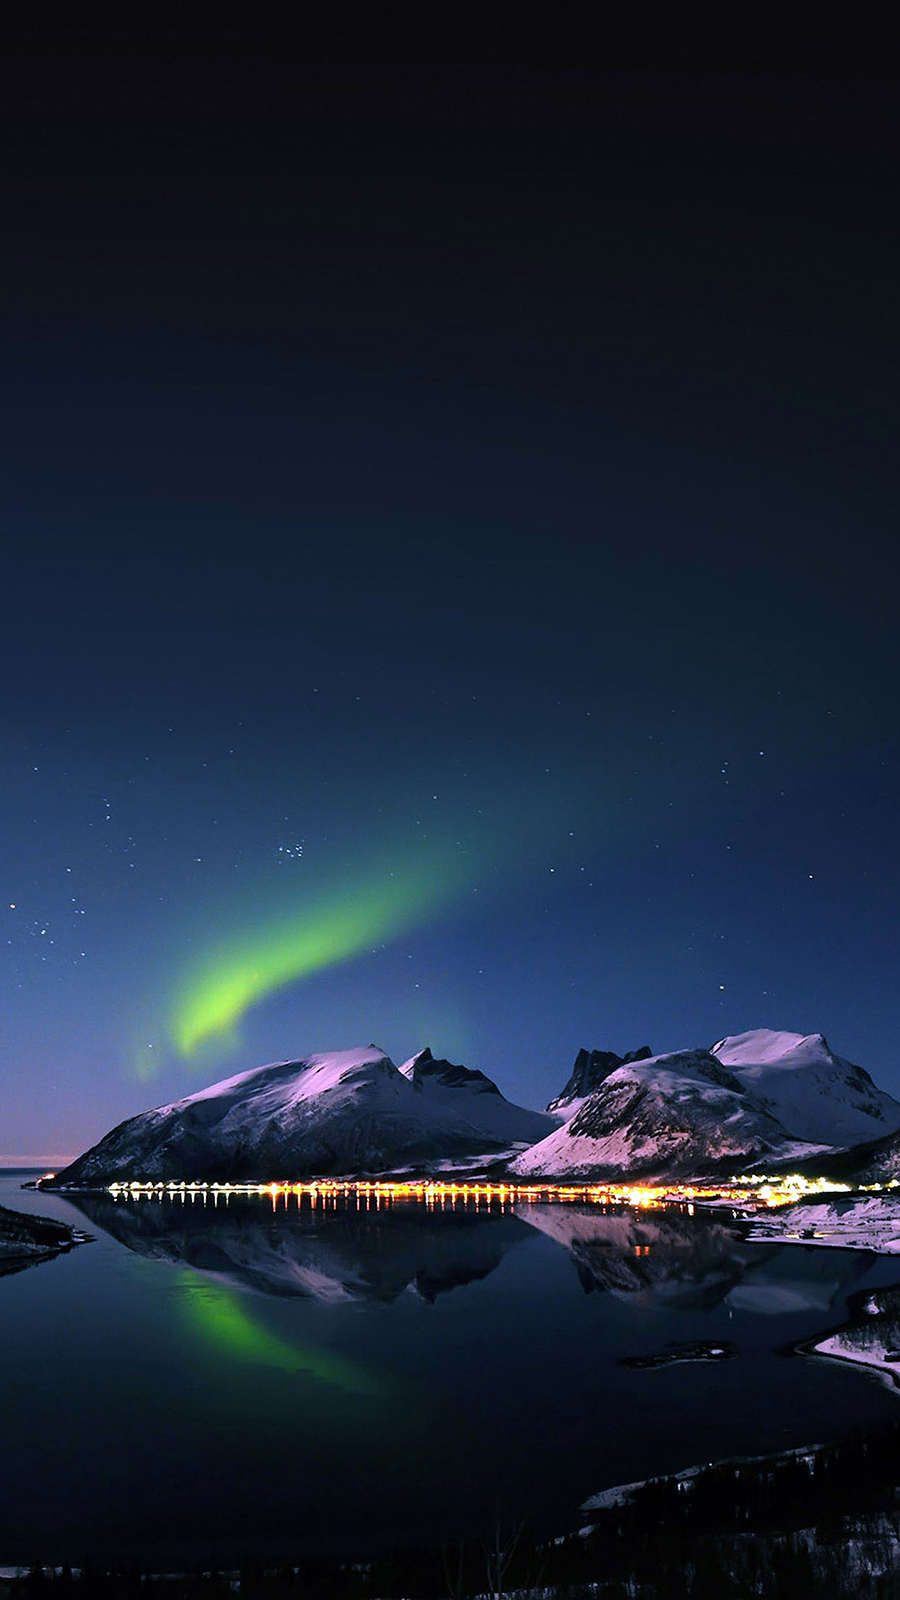 Aurora Night Snow Mountains Wallpapers Free Download